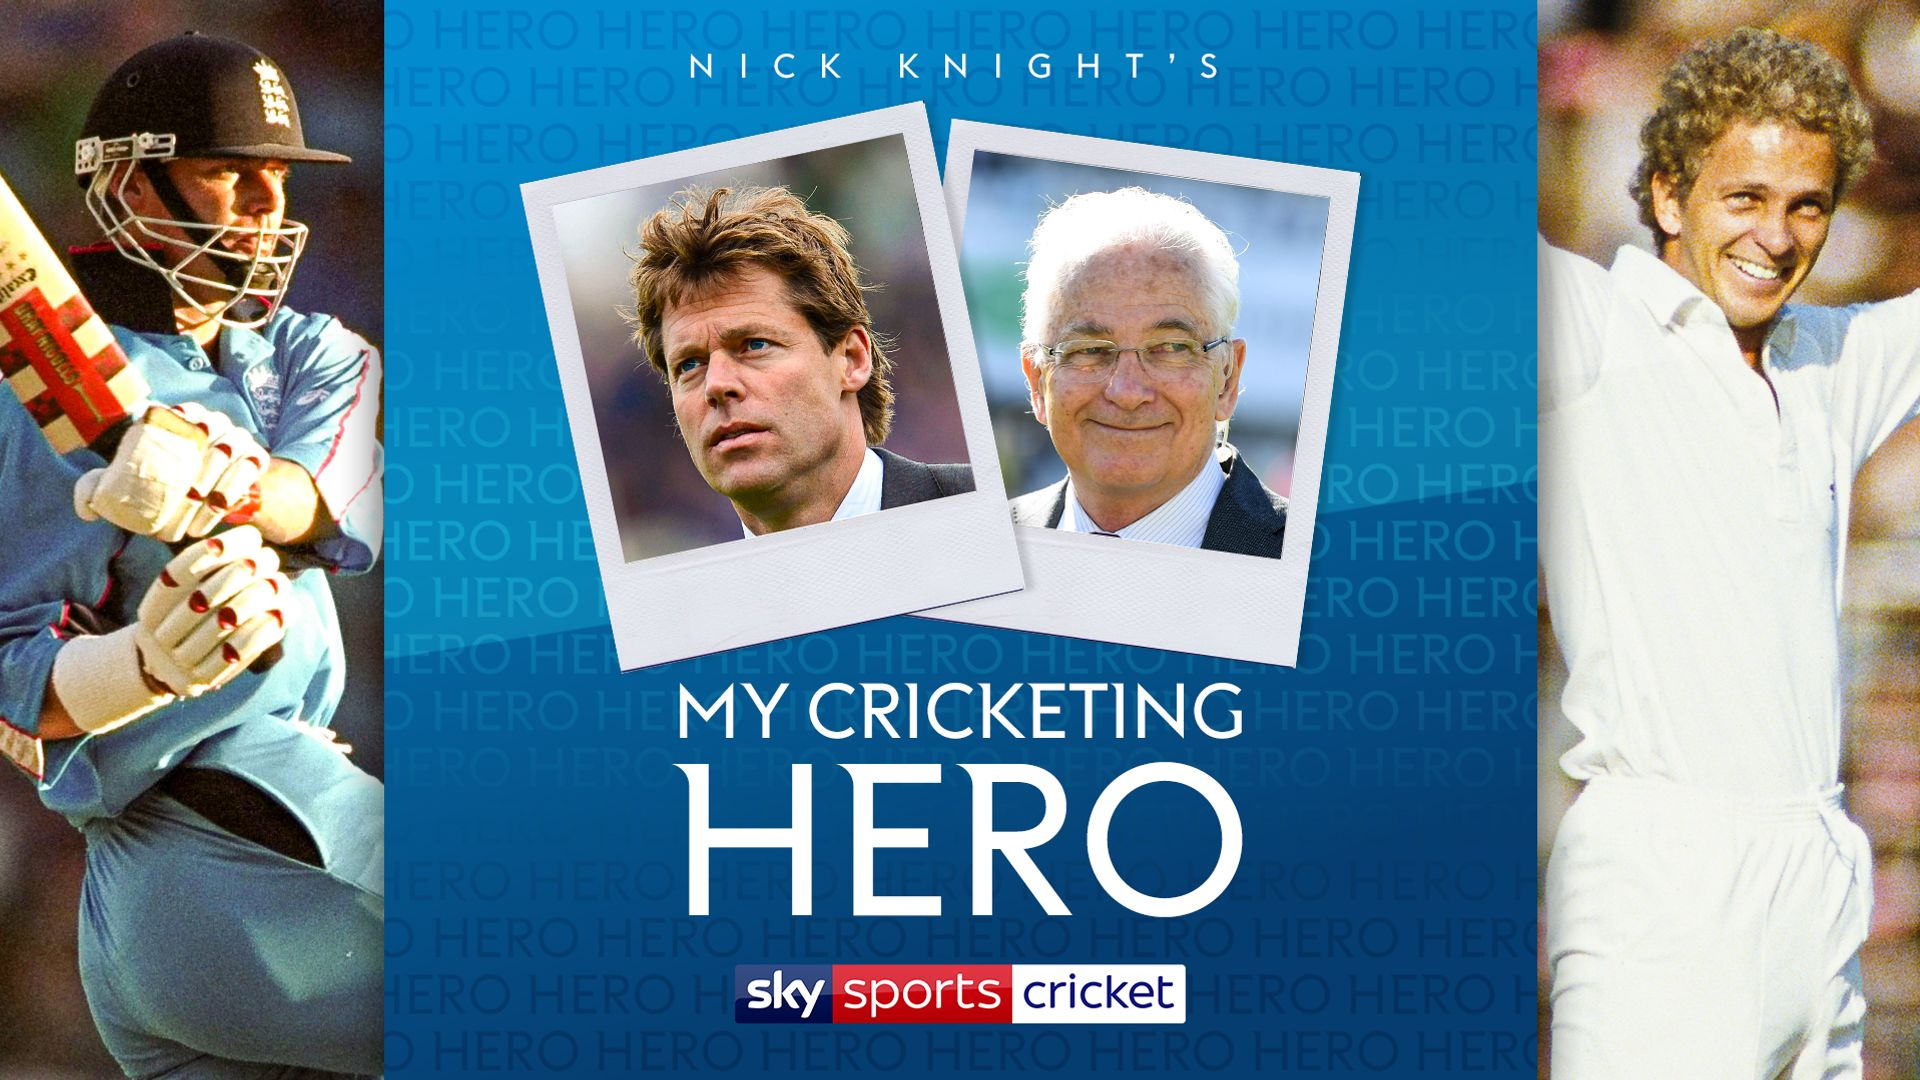 Nick Knight: My Cricketing Hero